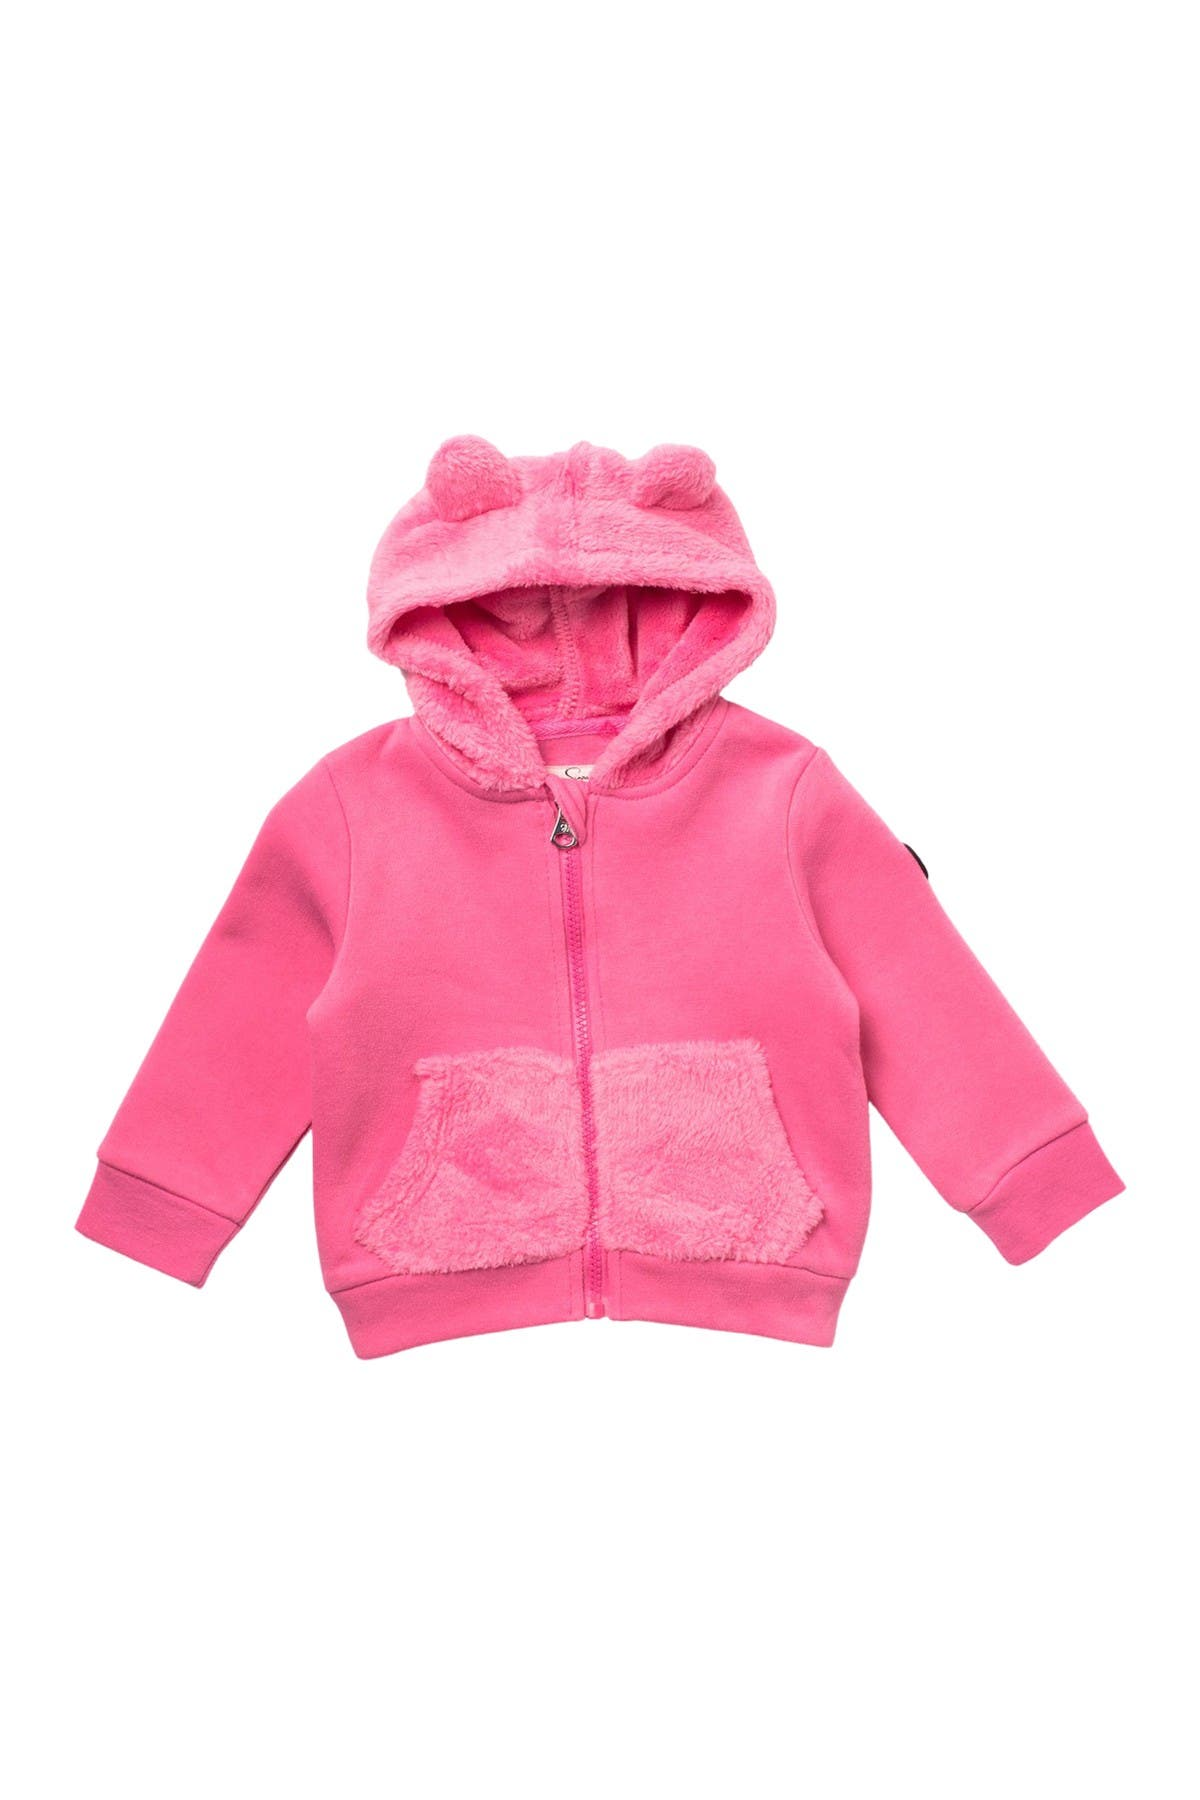 Image of Jessica Simpson Plush Faux Fur Trim Hooded Jacket